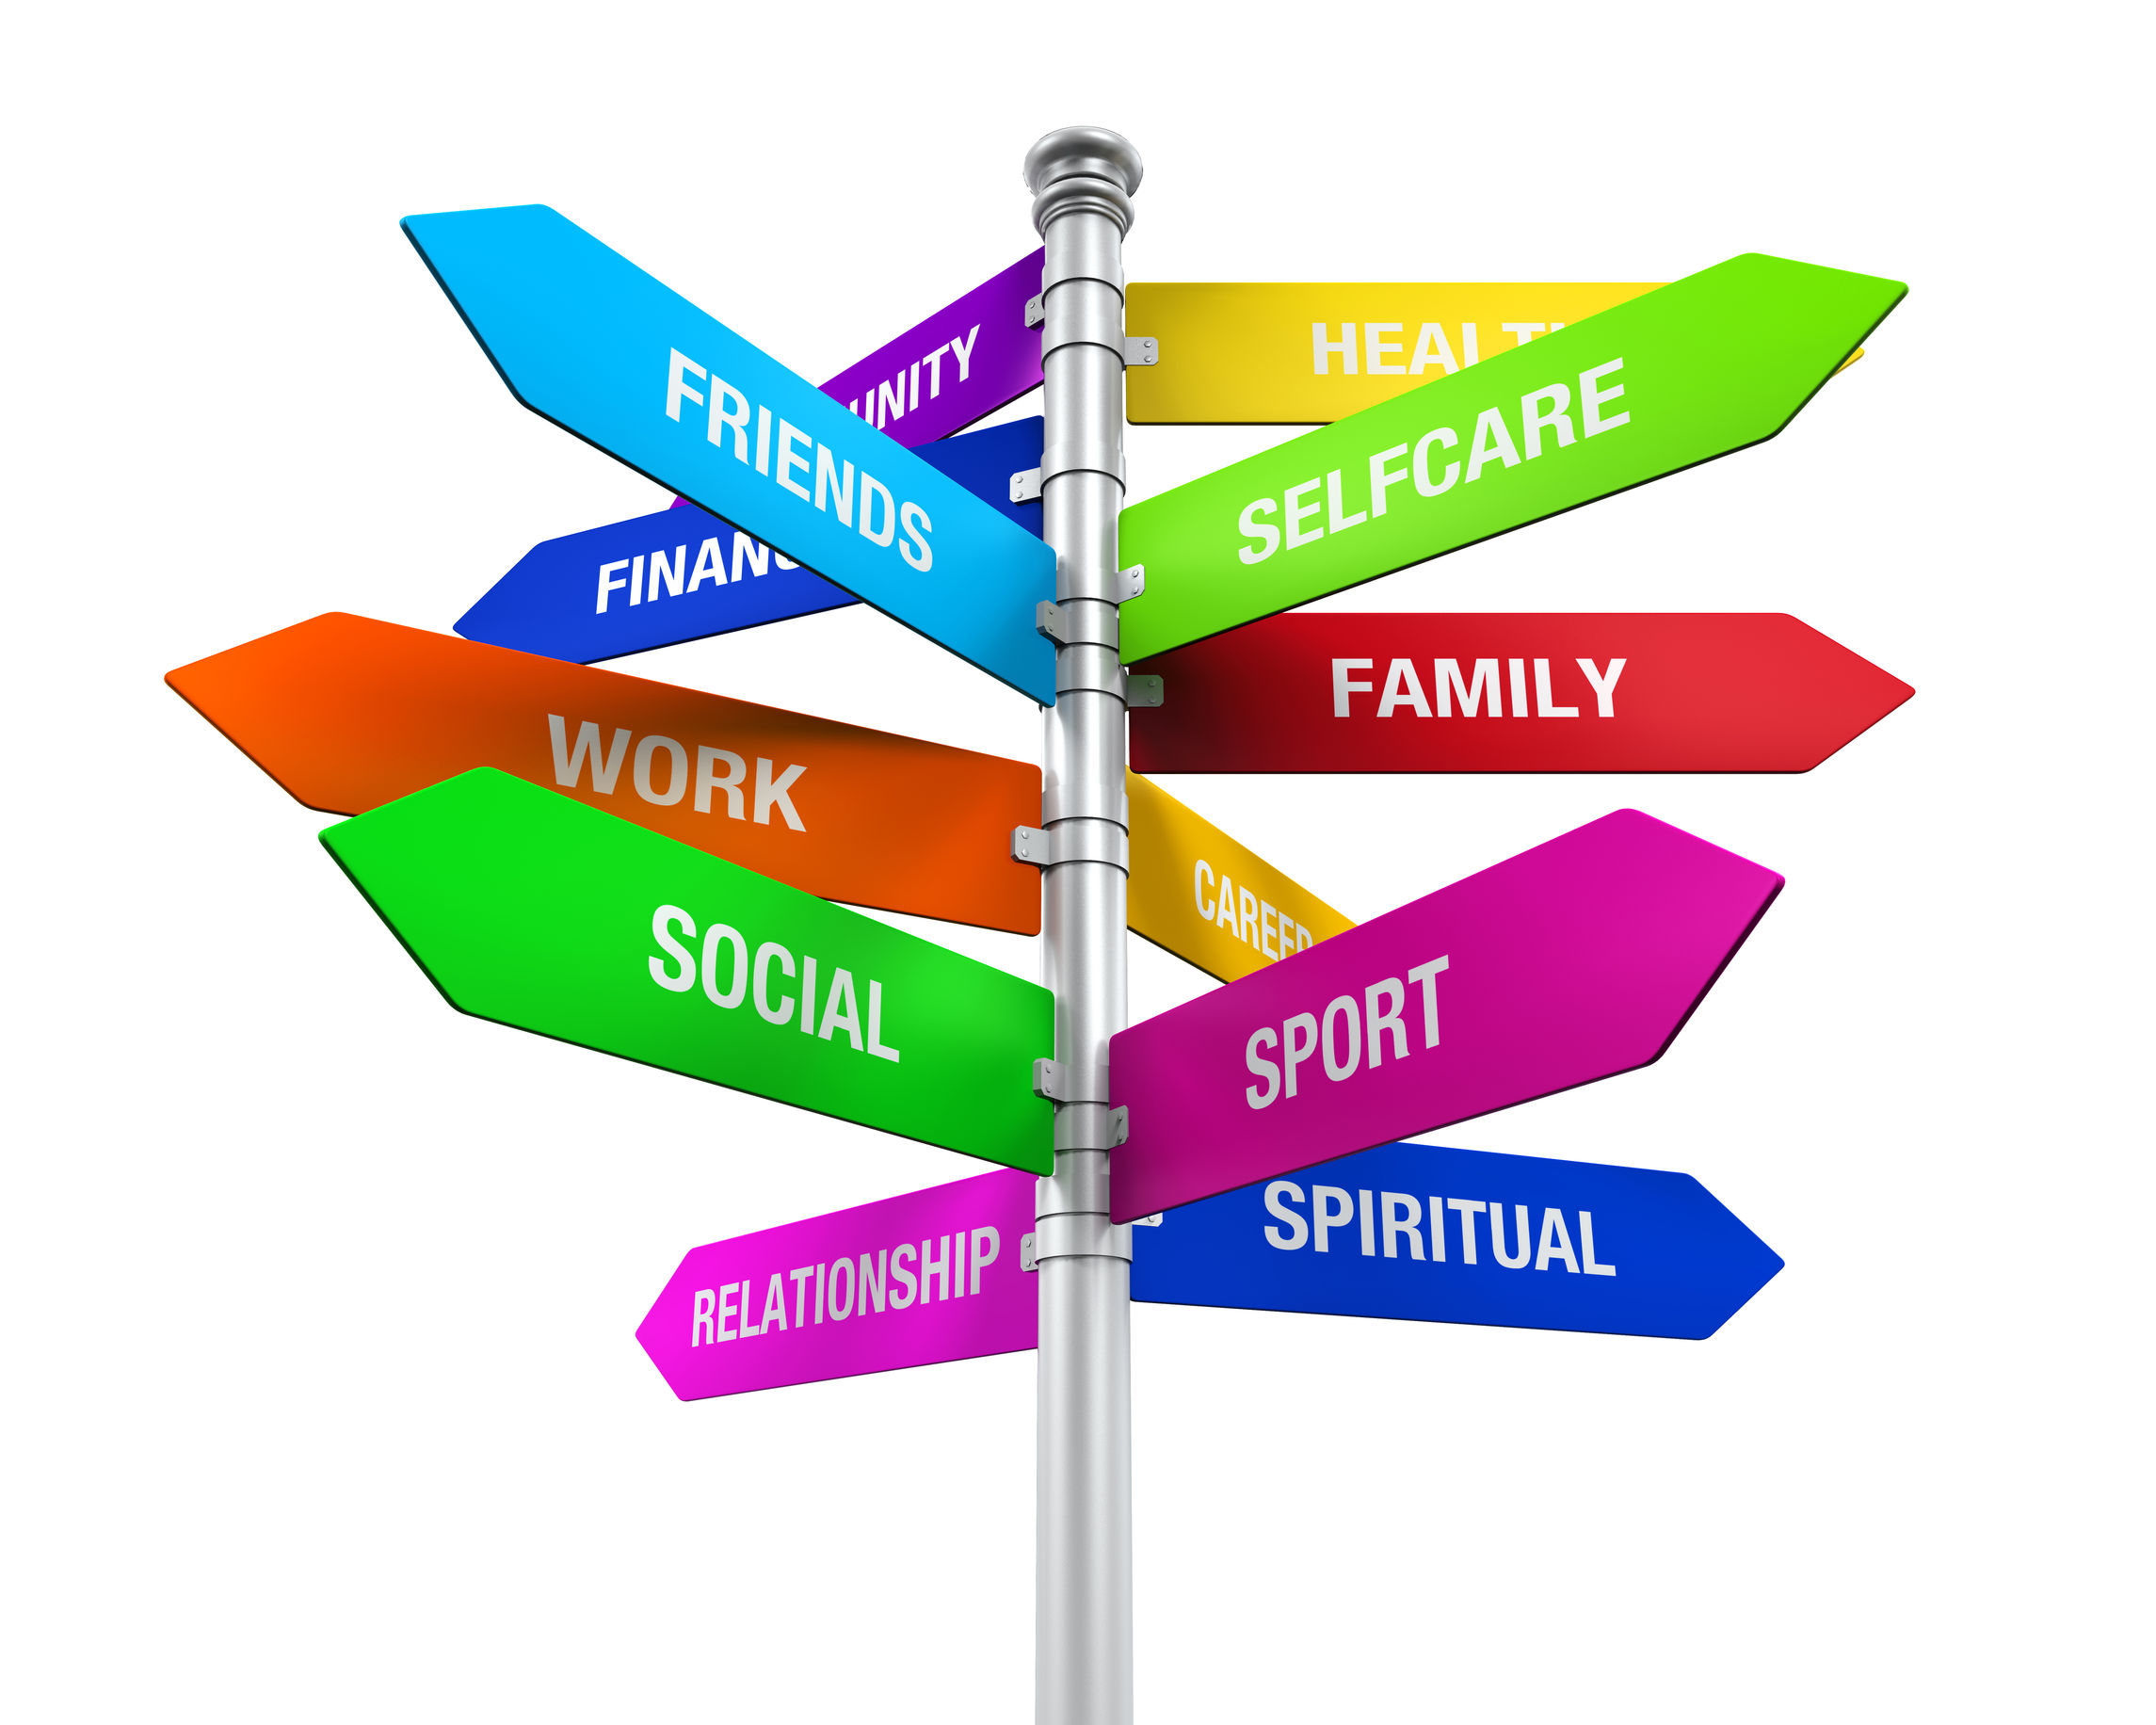 Health coaching of mind, body, soul. https://www.info-on-high-blood-pressure.com/Health-Coaching.html